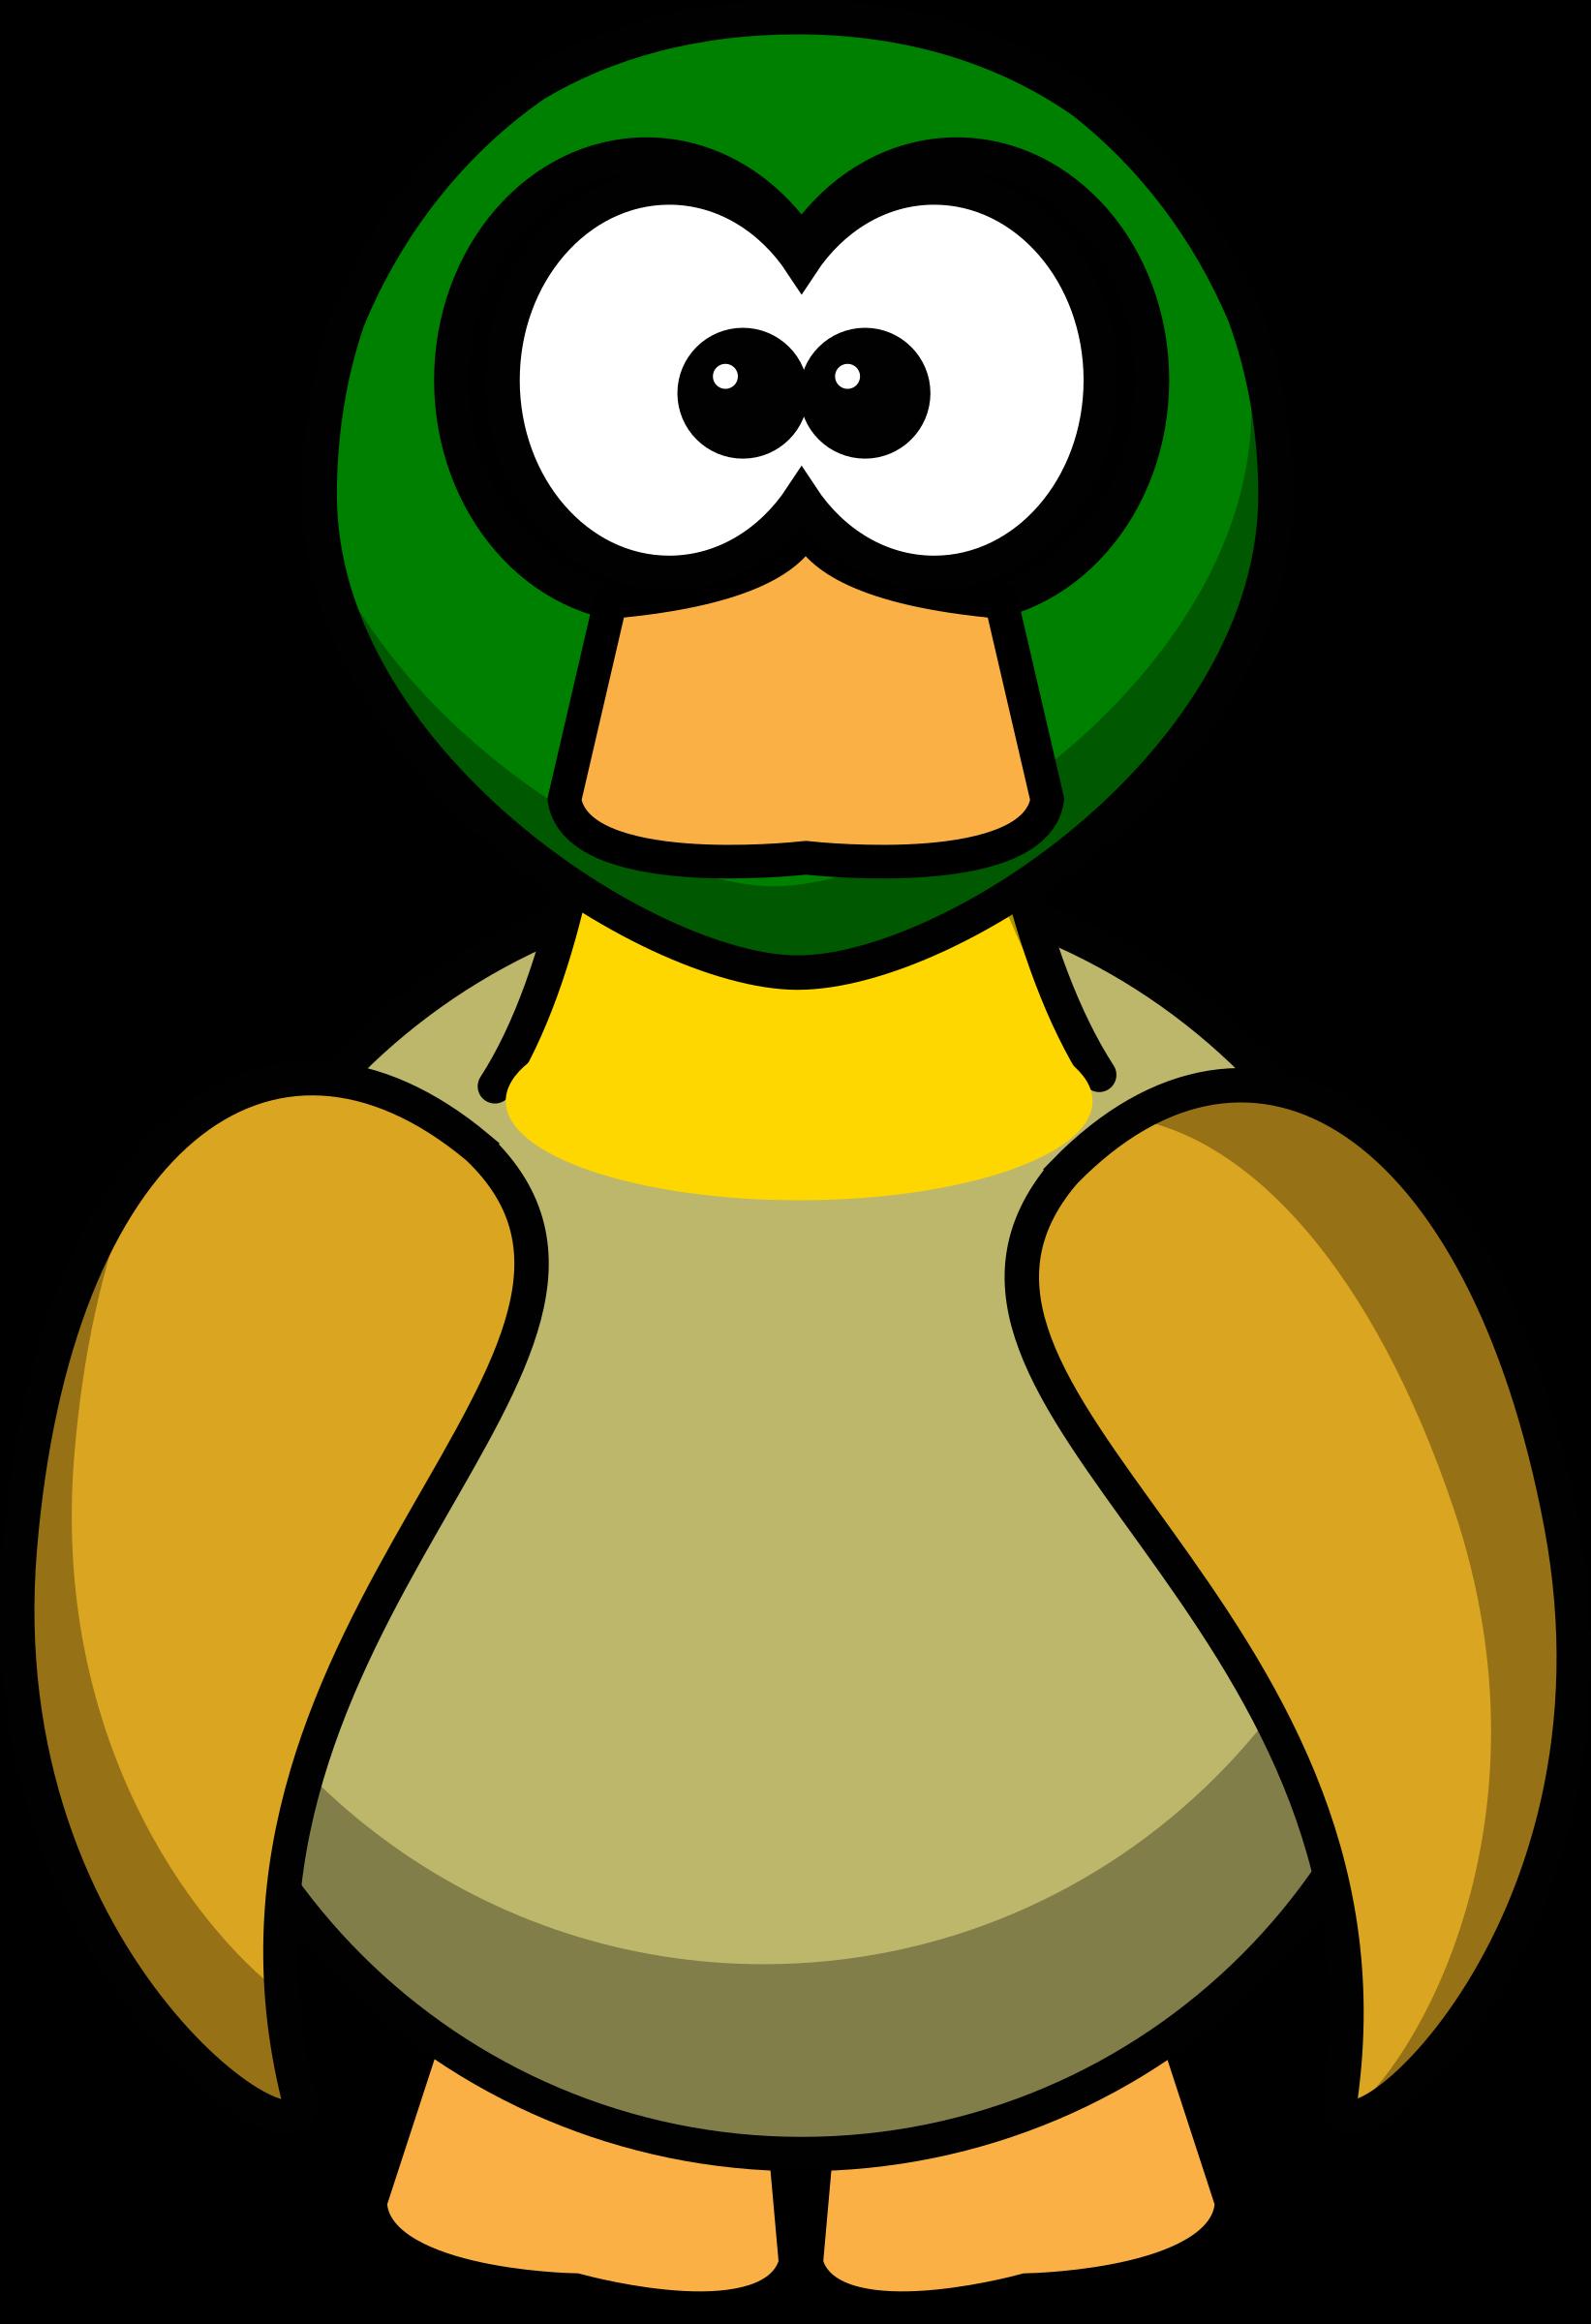 Ducks clipart animated. Cartoon duck